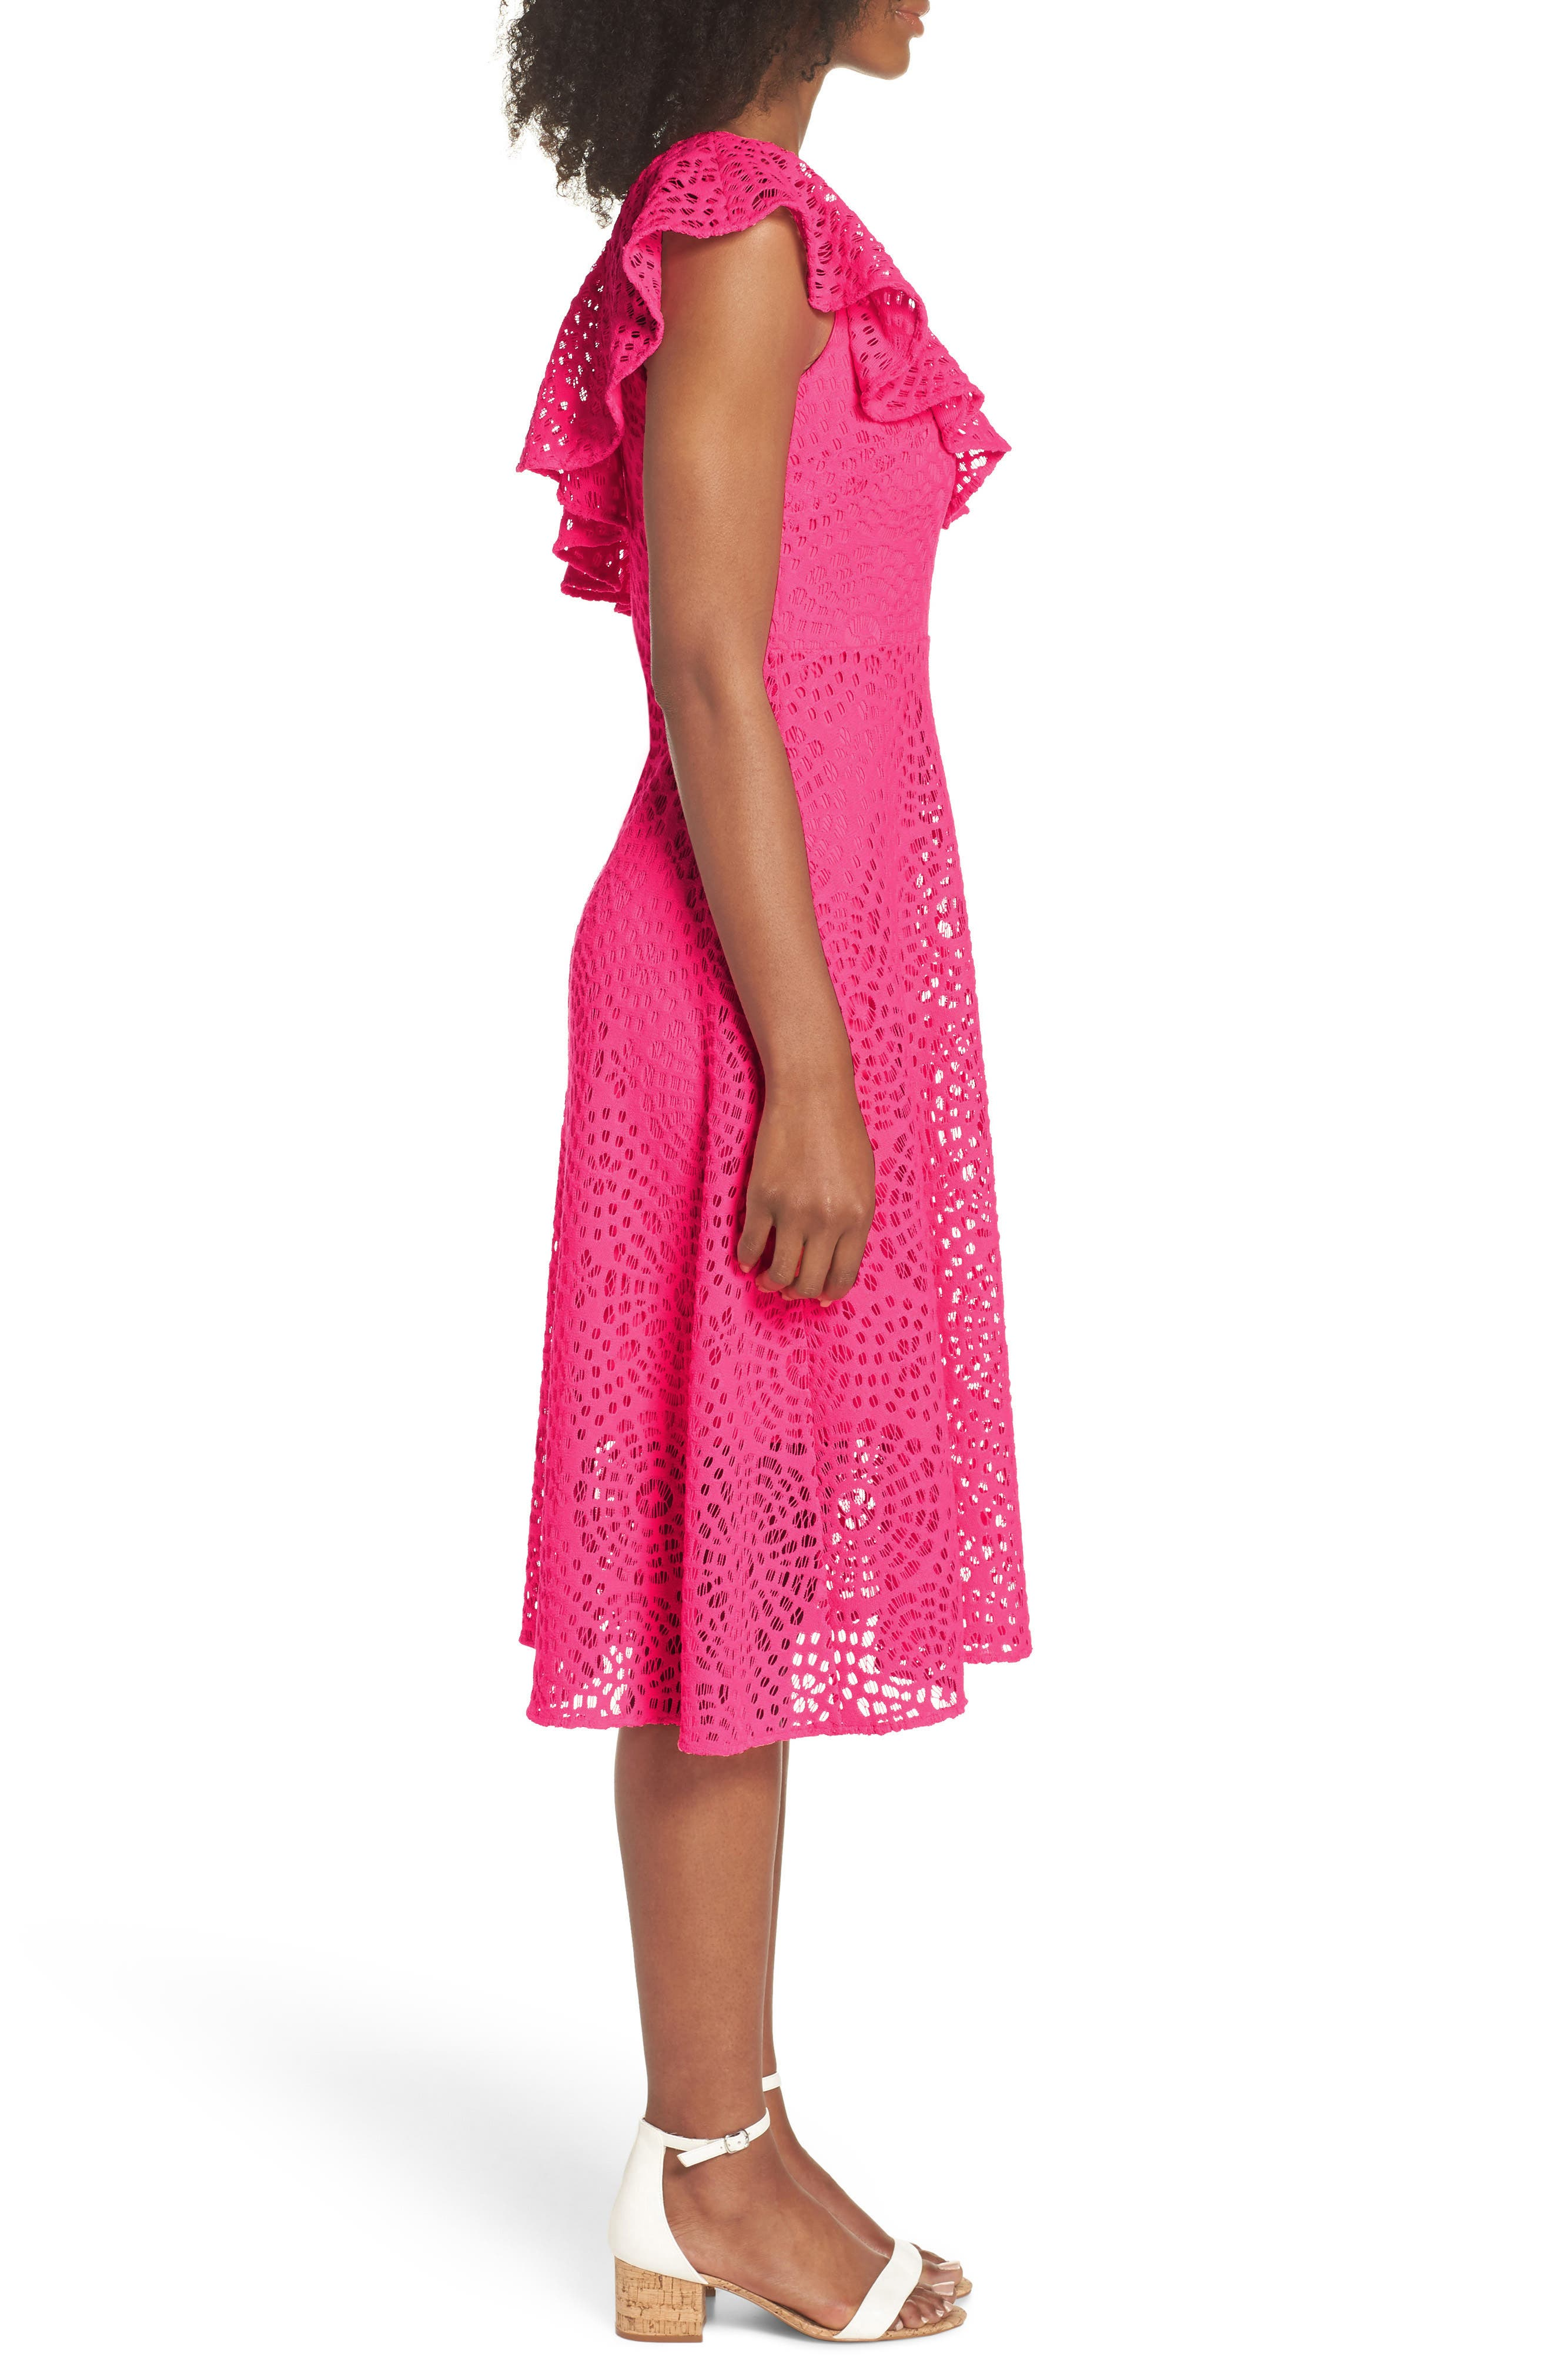 Callisto Ruffle One-Shoulder Midi Dress,                             Alternate thumbnail 3, color,                             PINK SEA URCHIN TERRY LACE